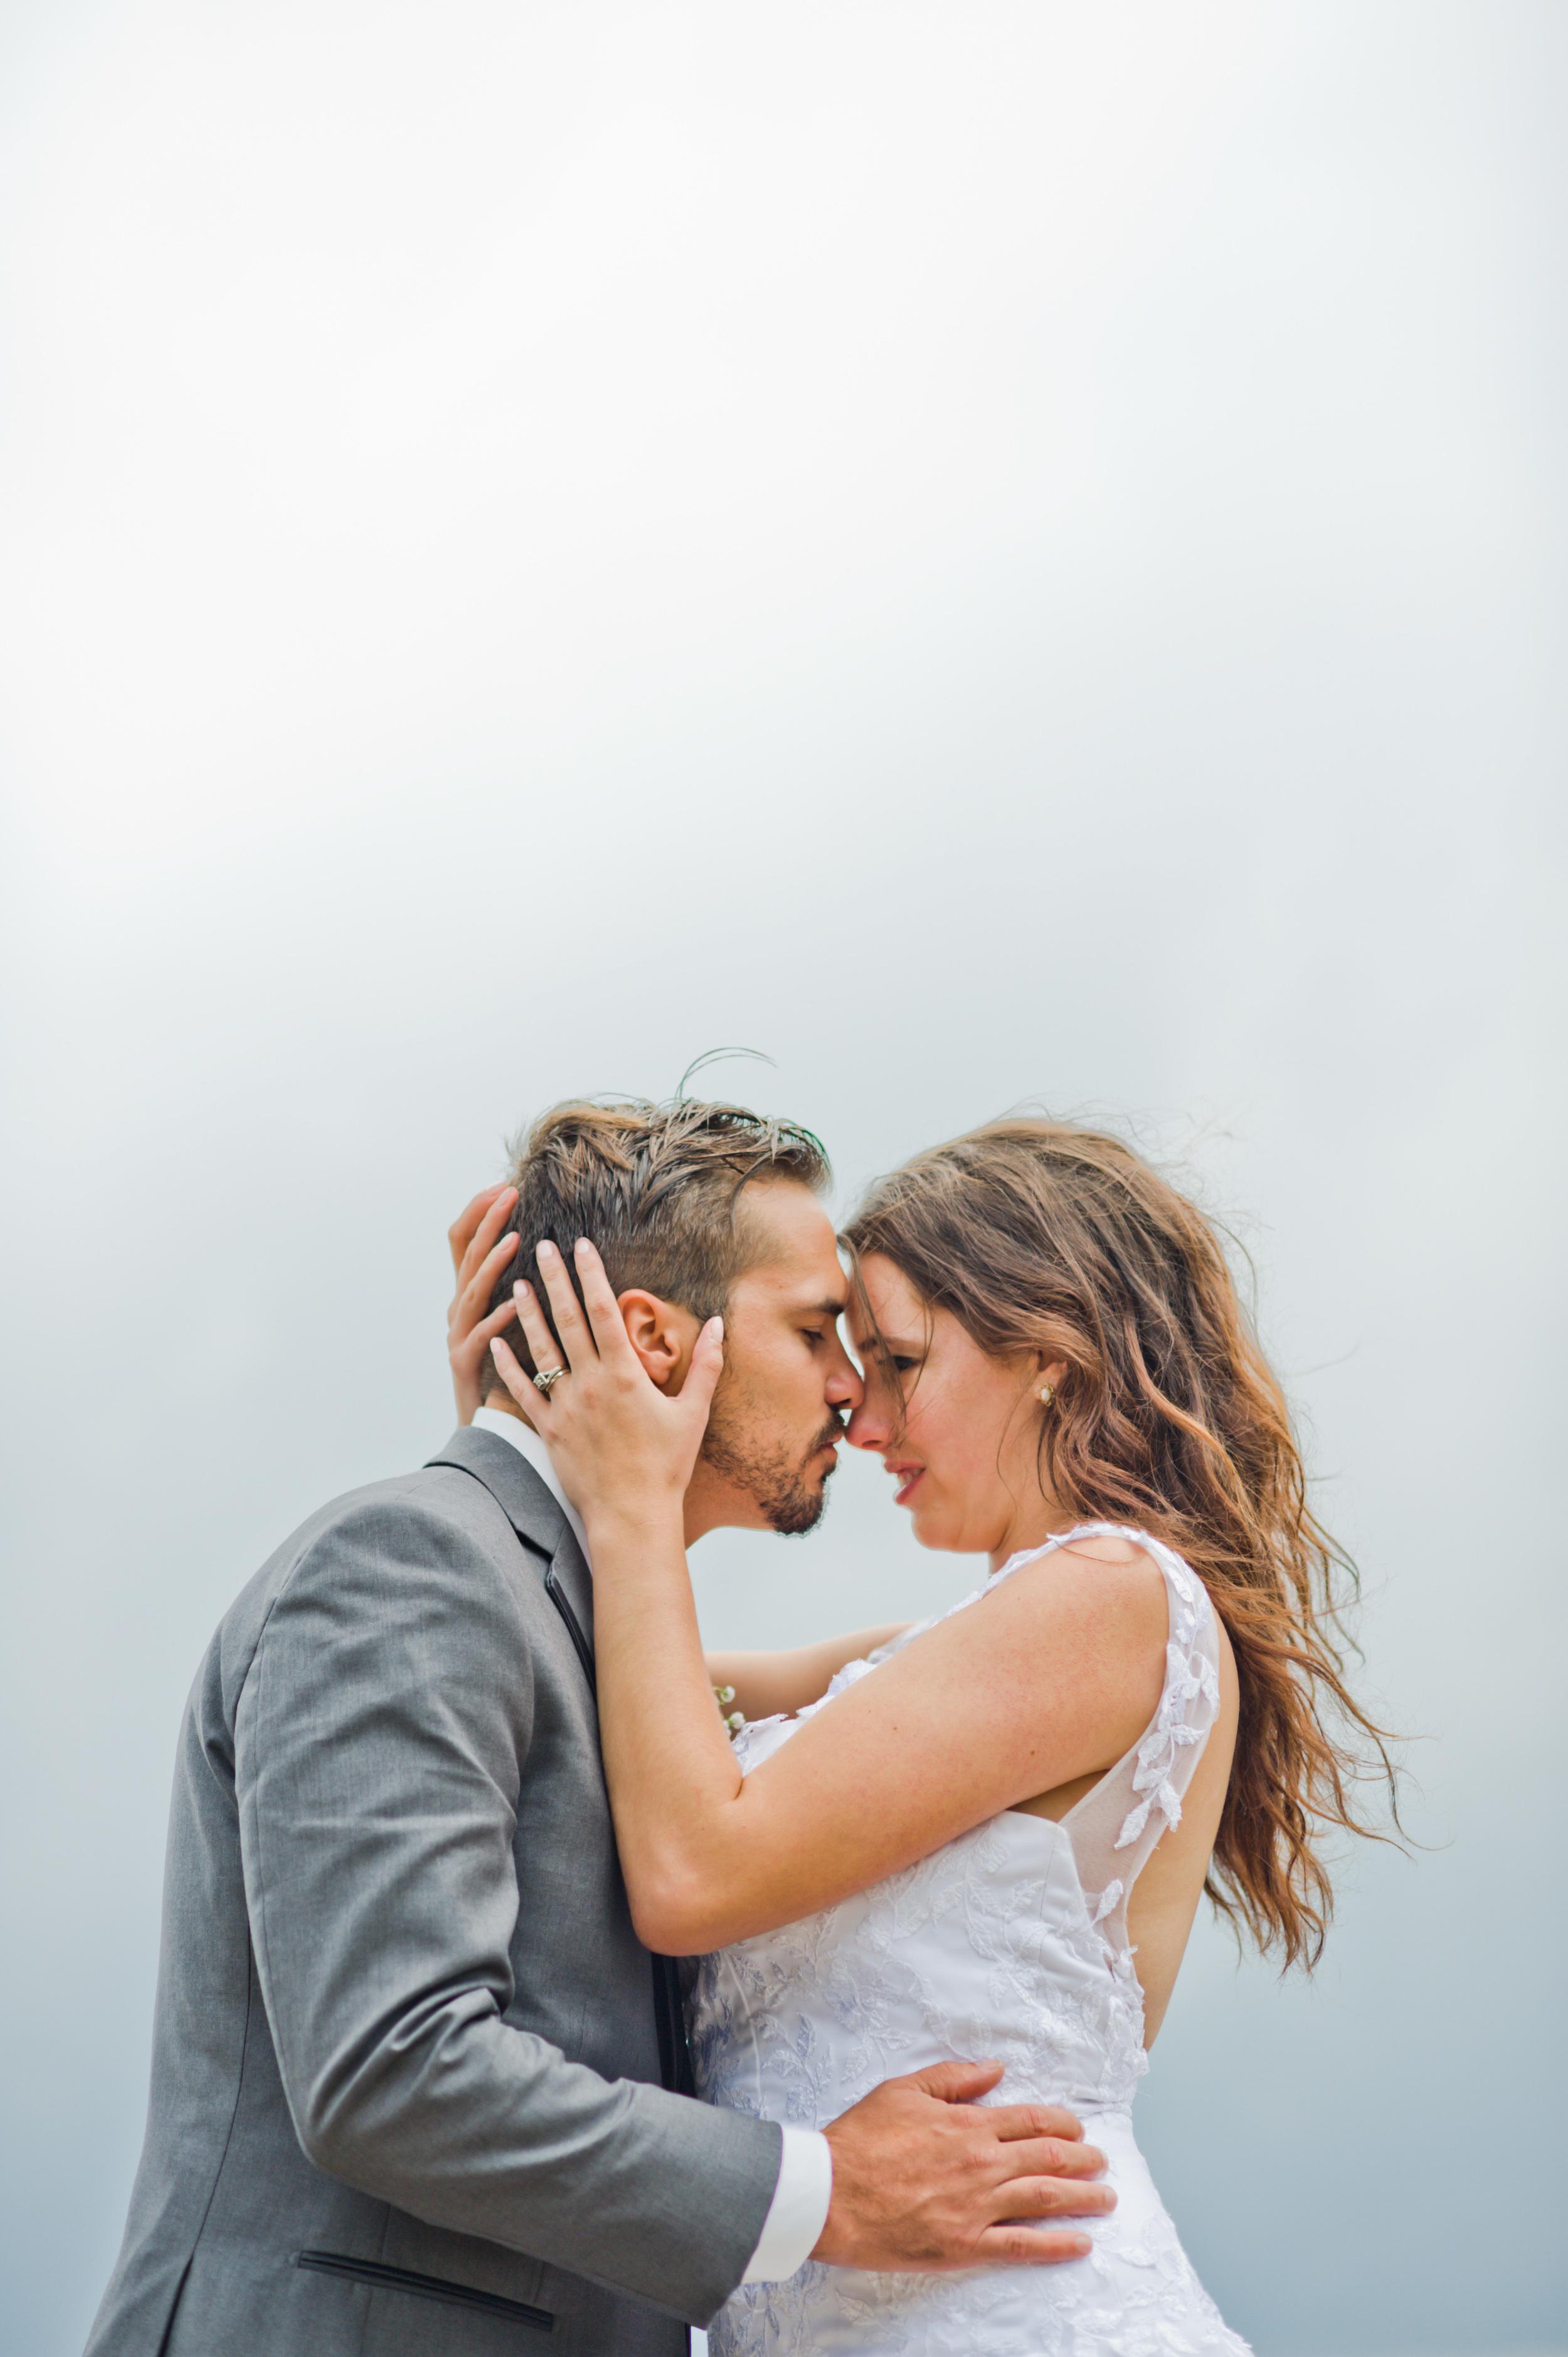 The Notebook Wedding